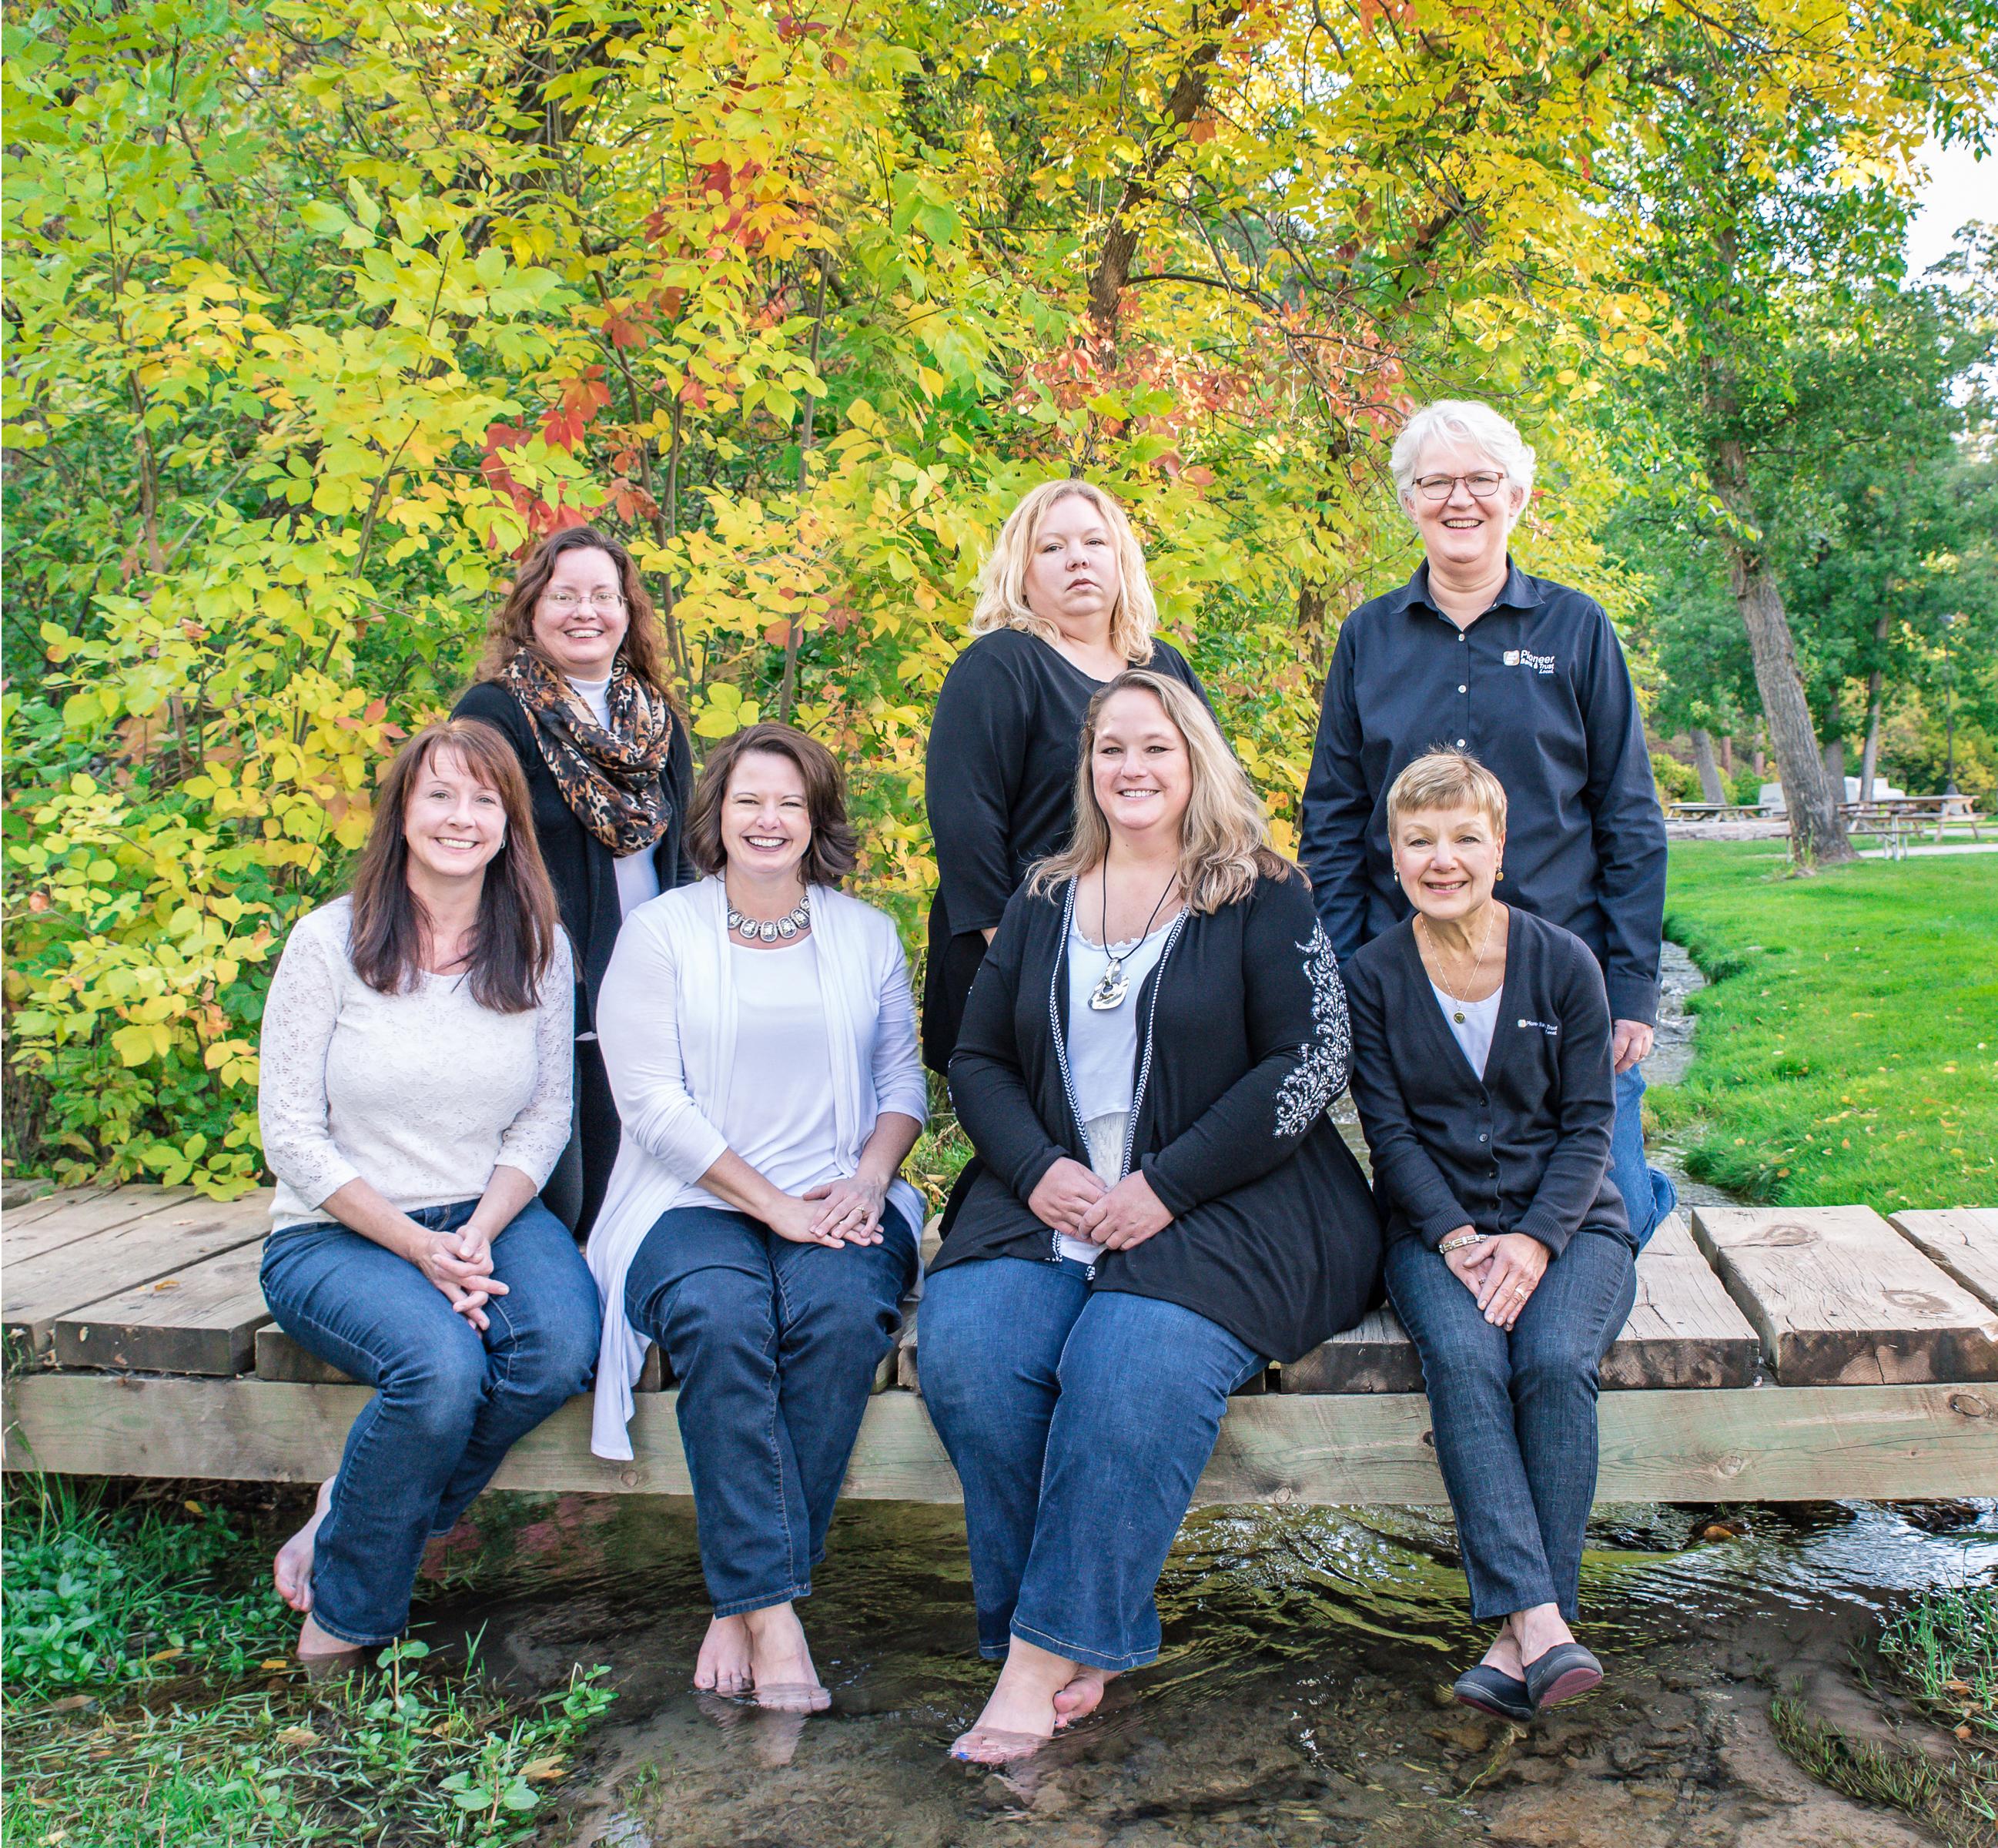 Belle Fourche: Front Row: Cherie, Melynda, Brenda, Amy & Marcie Back Row: Michelle, Linda, Betty & Sandy